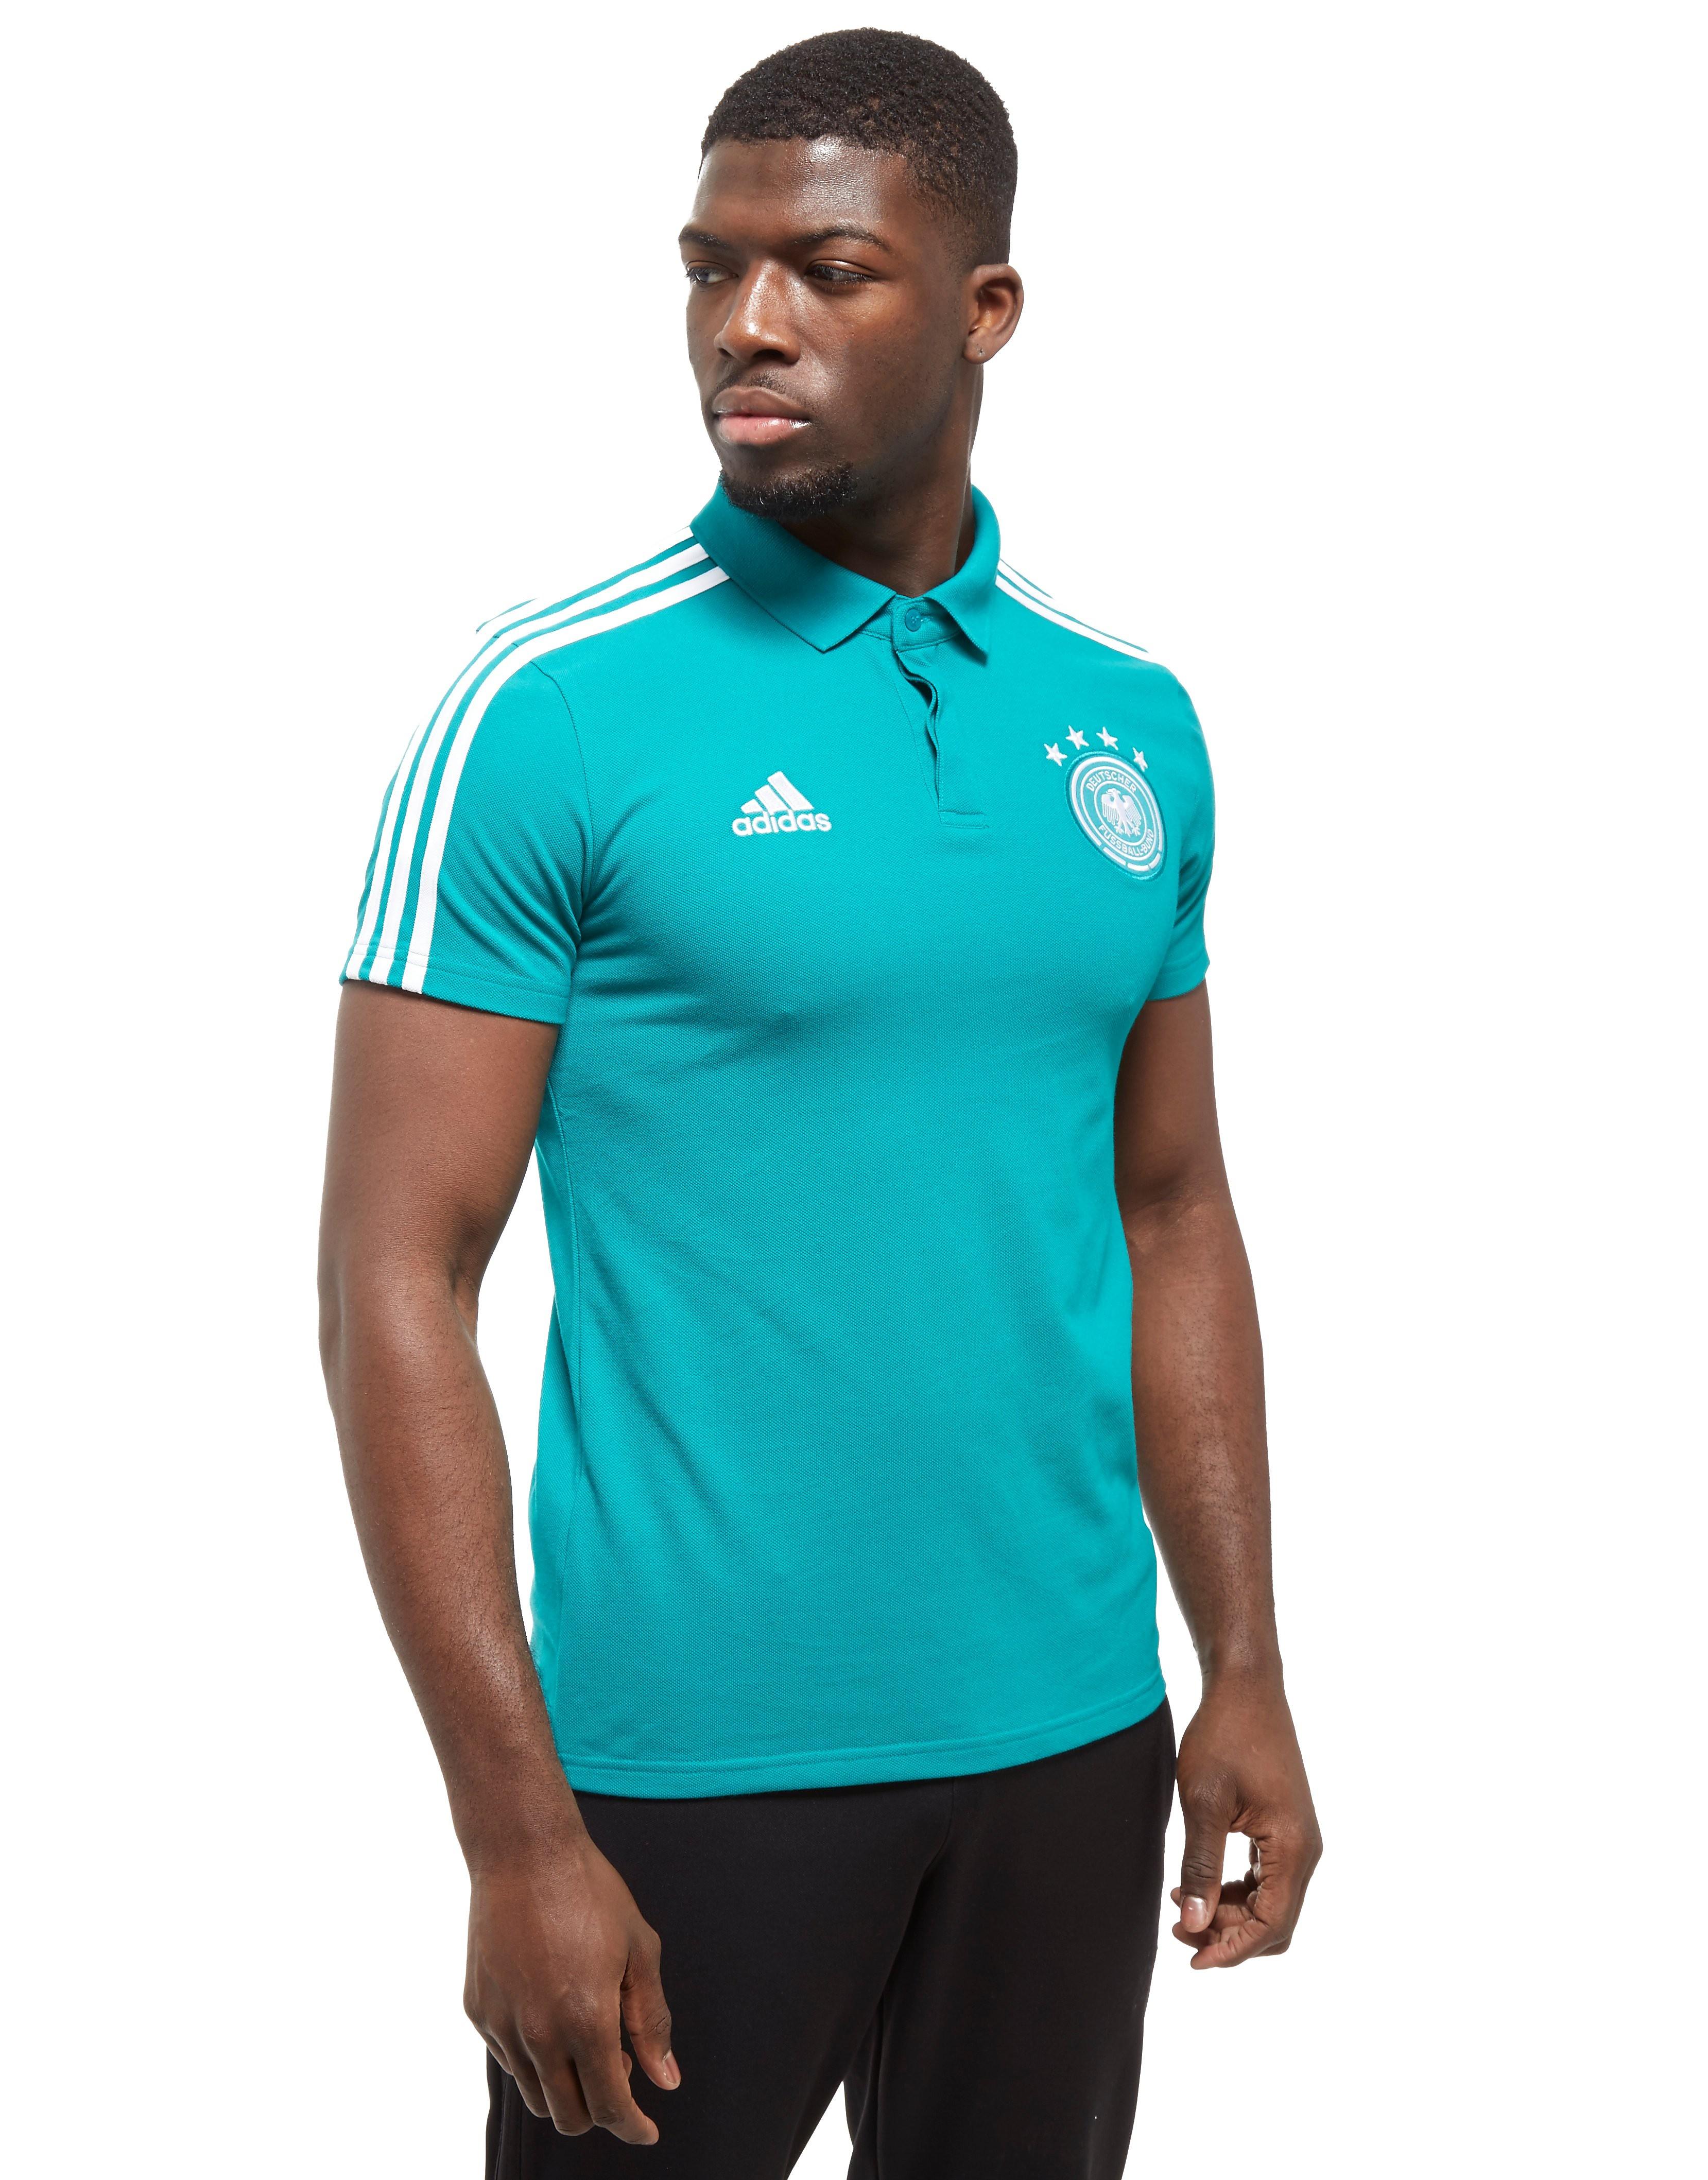 adidas DFB Deutschland 2018 Polo Shirt